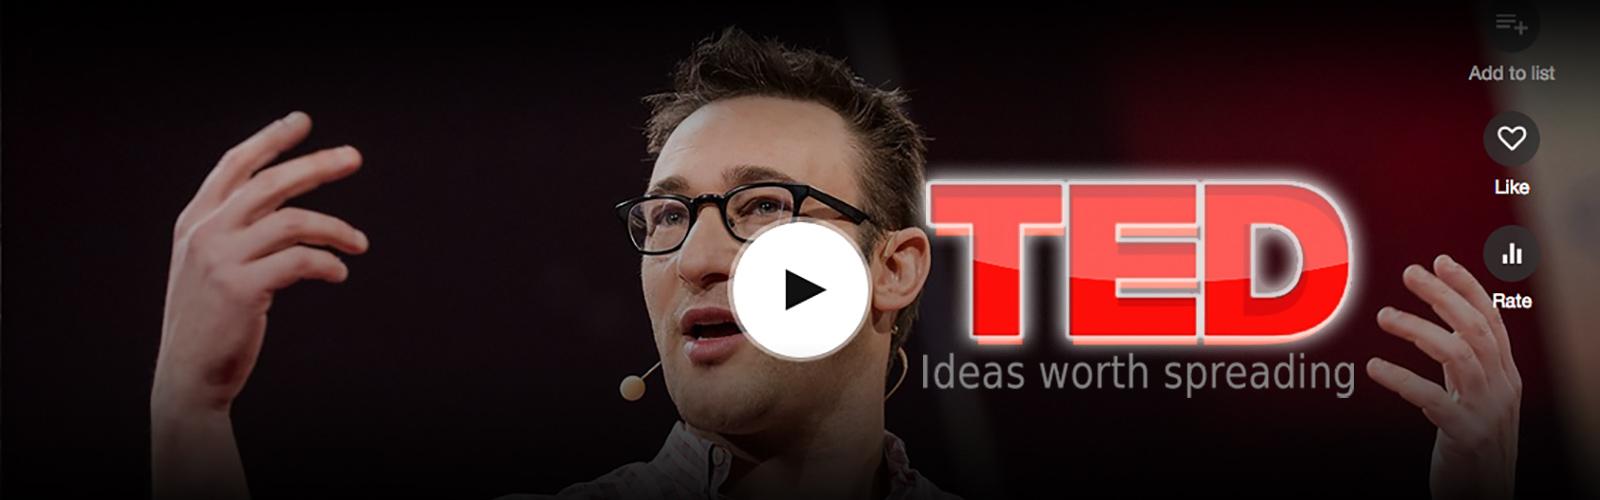 Simon Sinek TED Talk Image